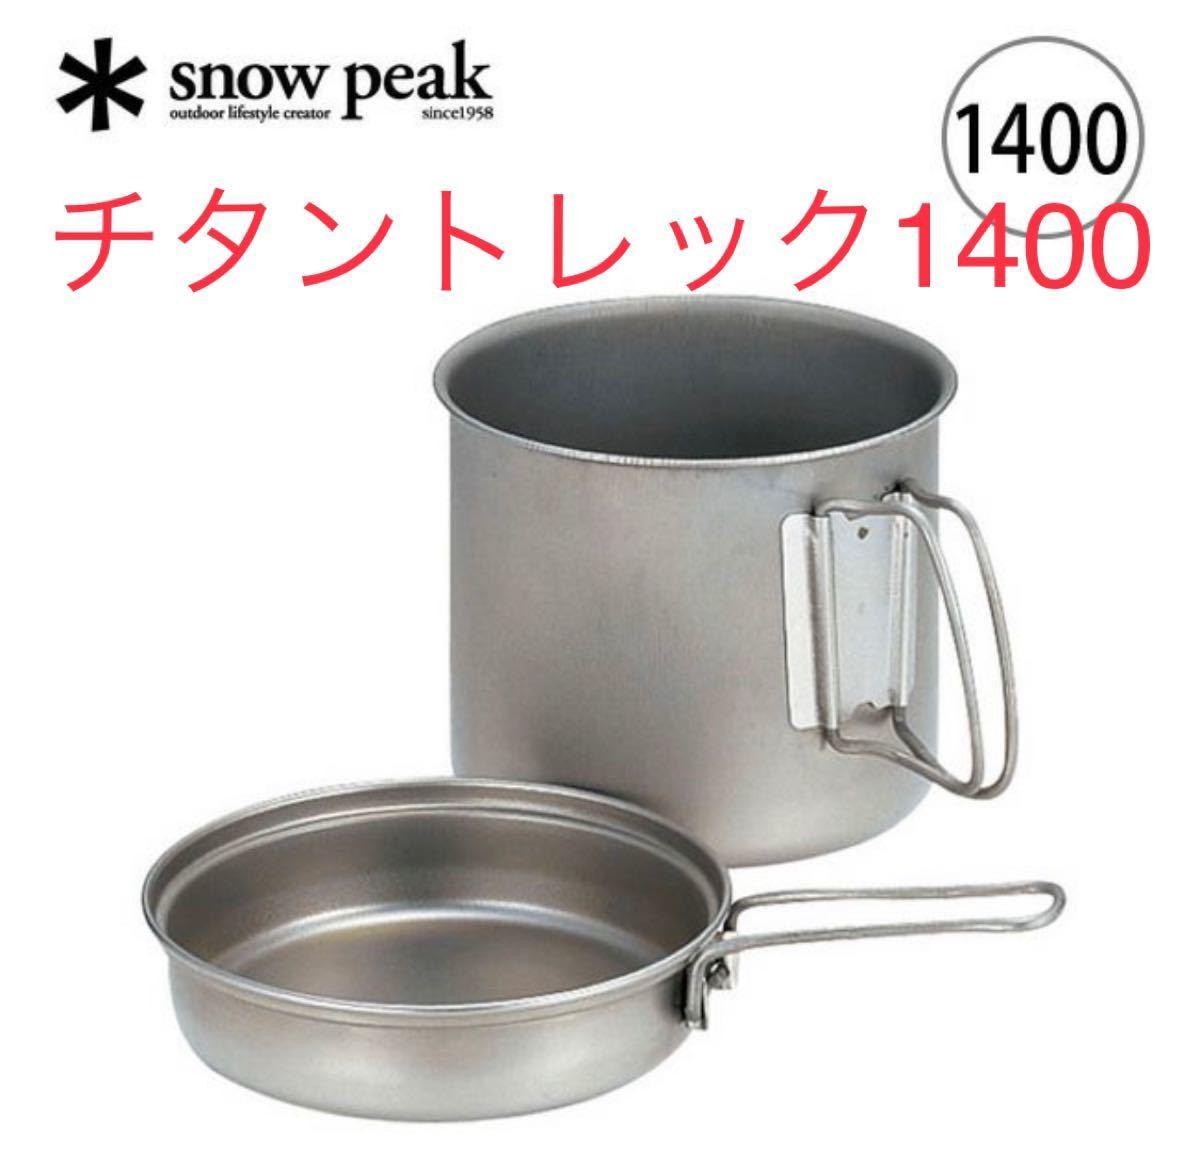 snow peak スノーピーク チタントレック 1400 SCS-009T クッカー コッヘル